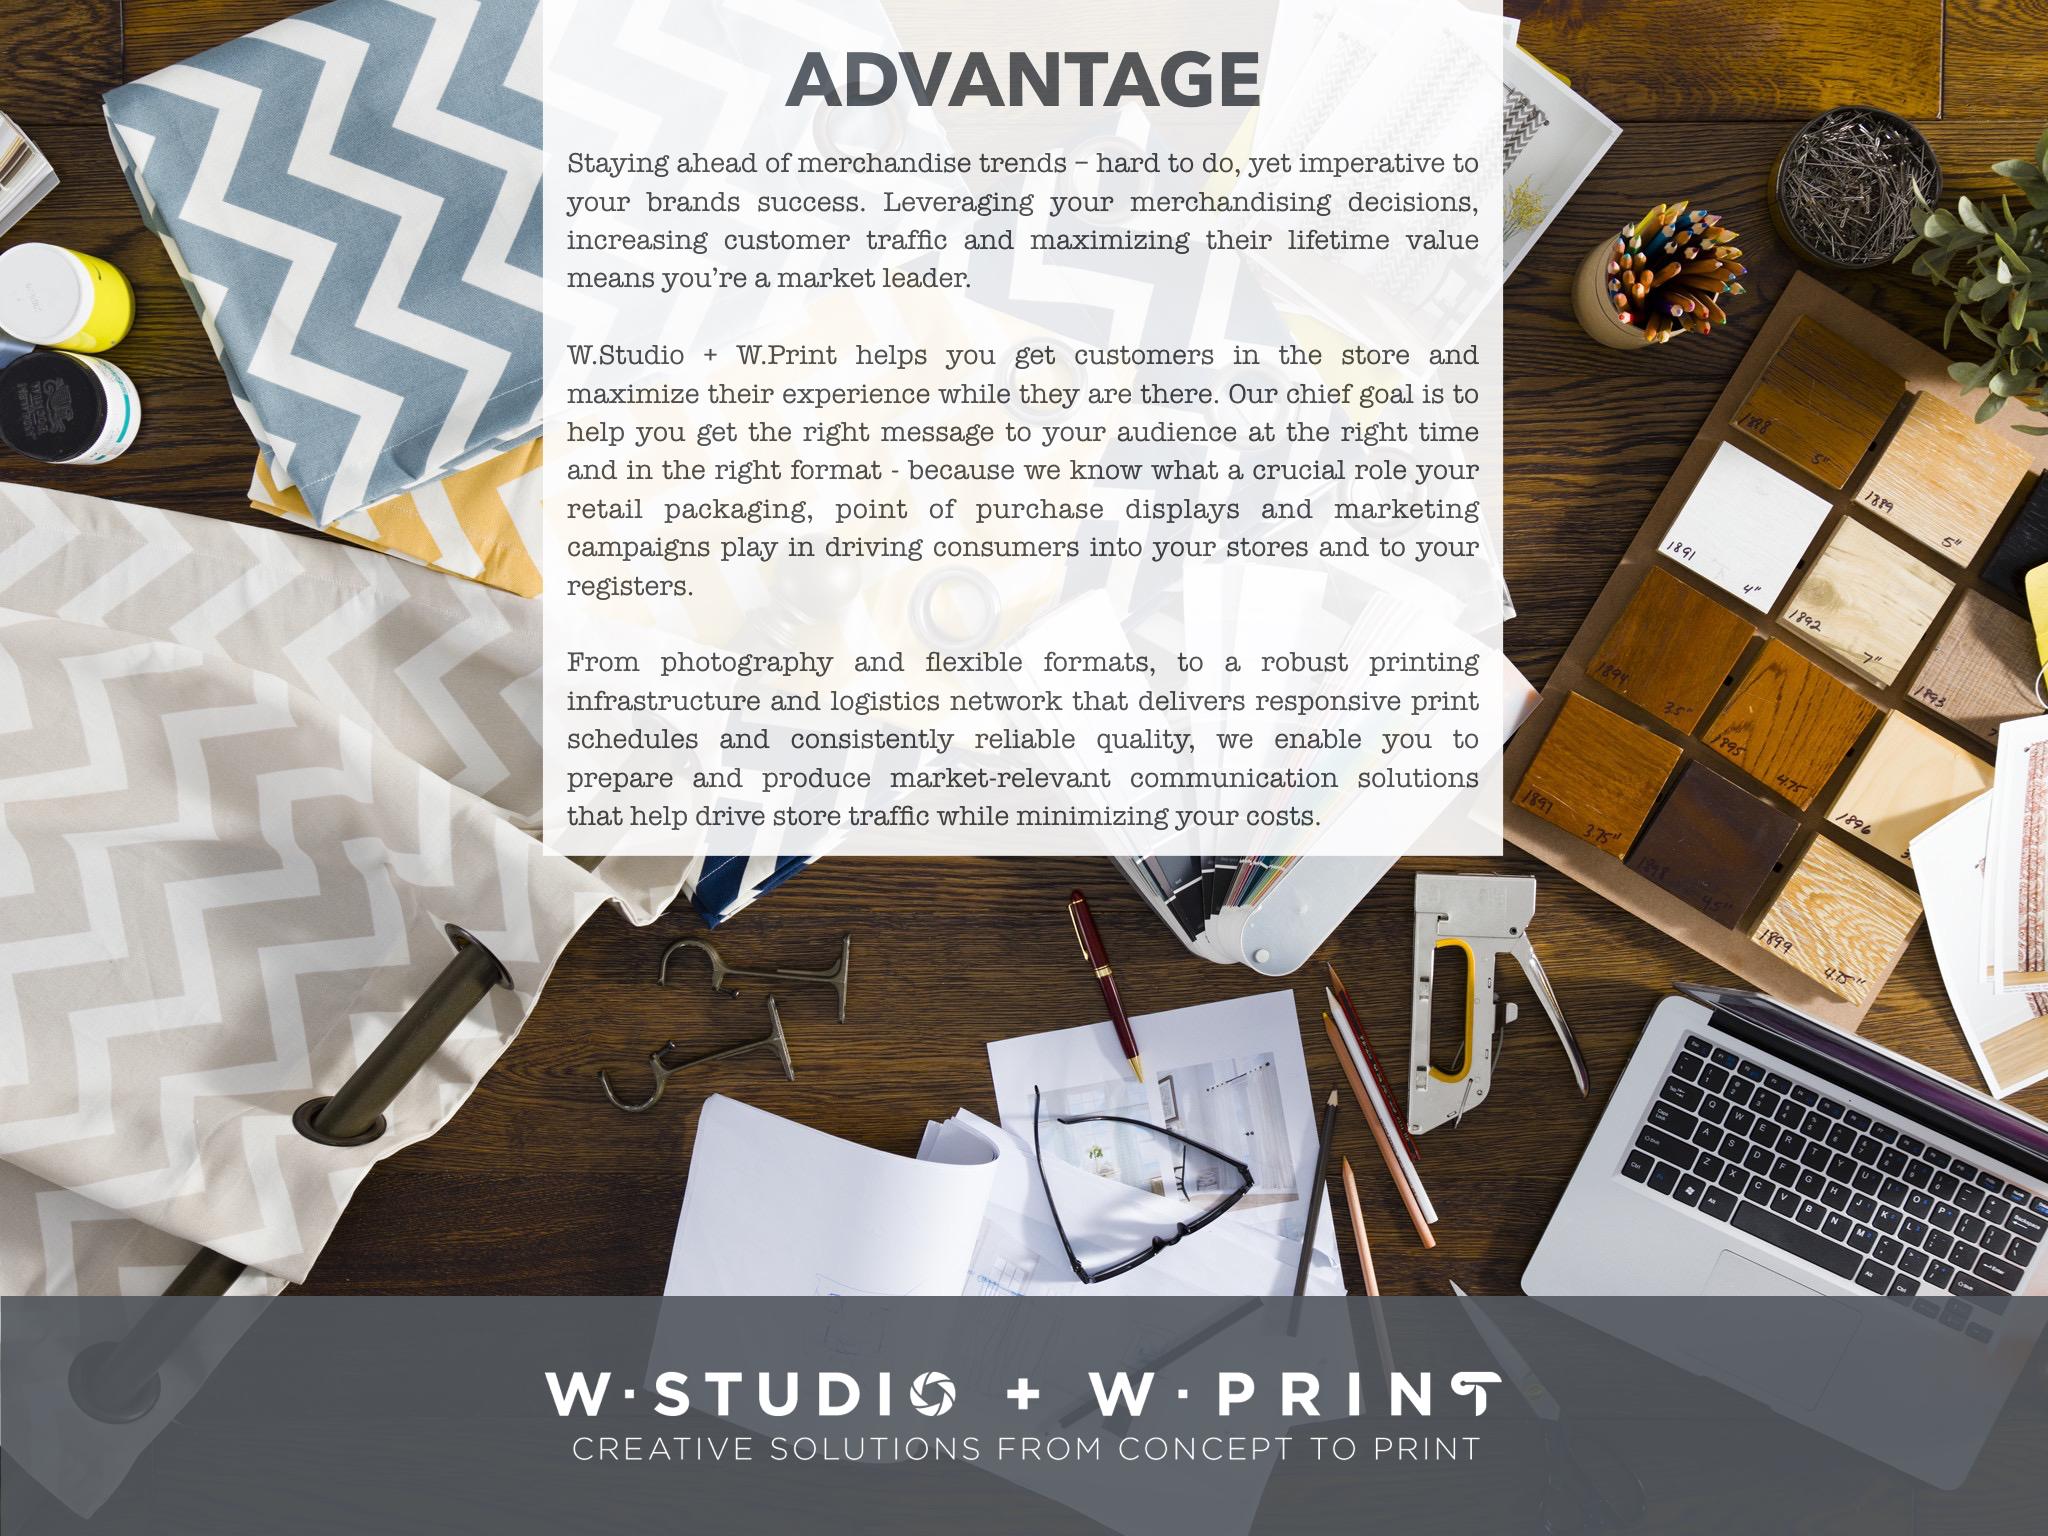 wsp-wprint-presentation-jpg.002.jpeg